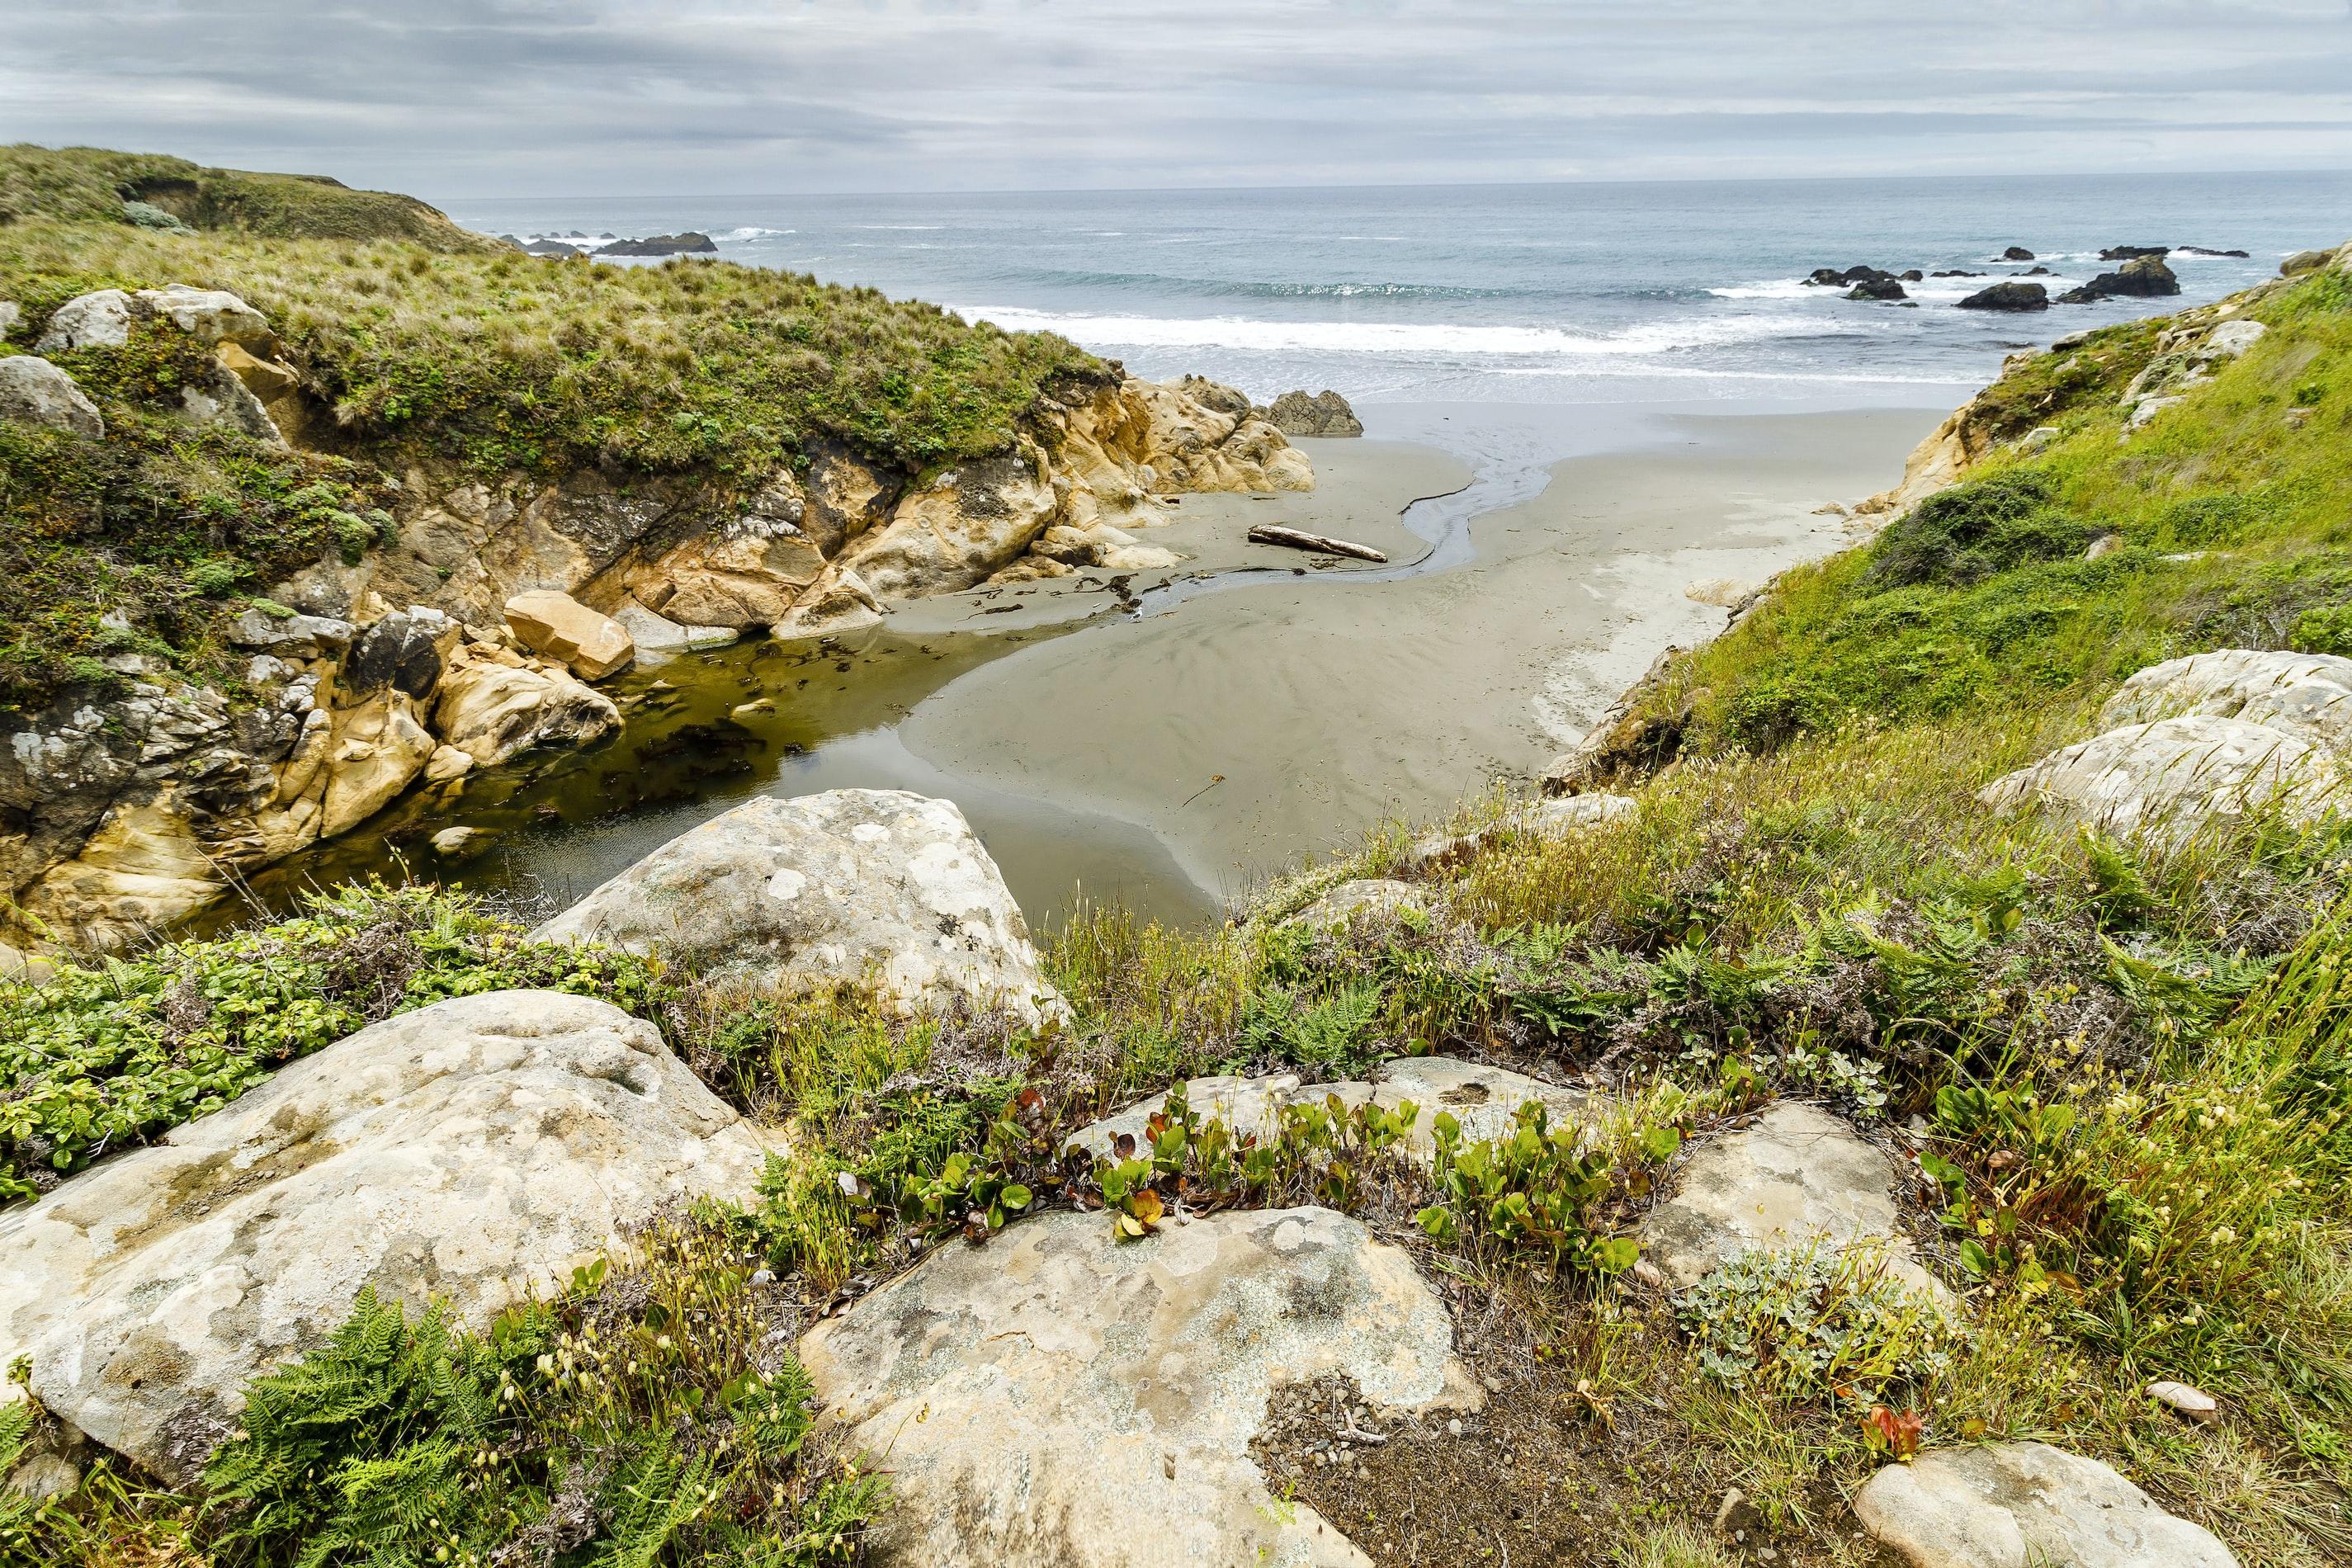 Green covered beach in Sonoma, CA